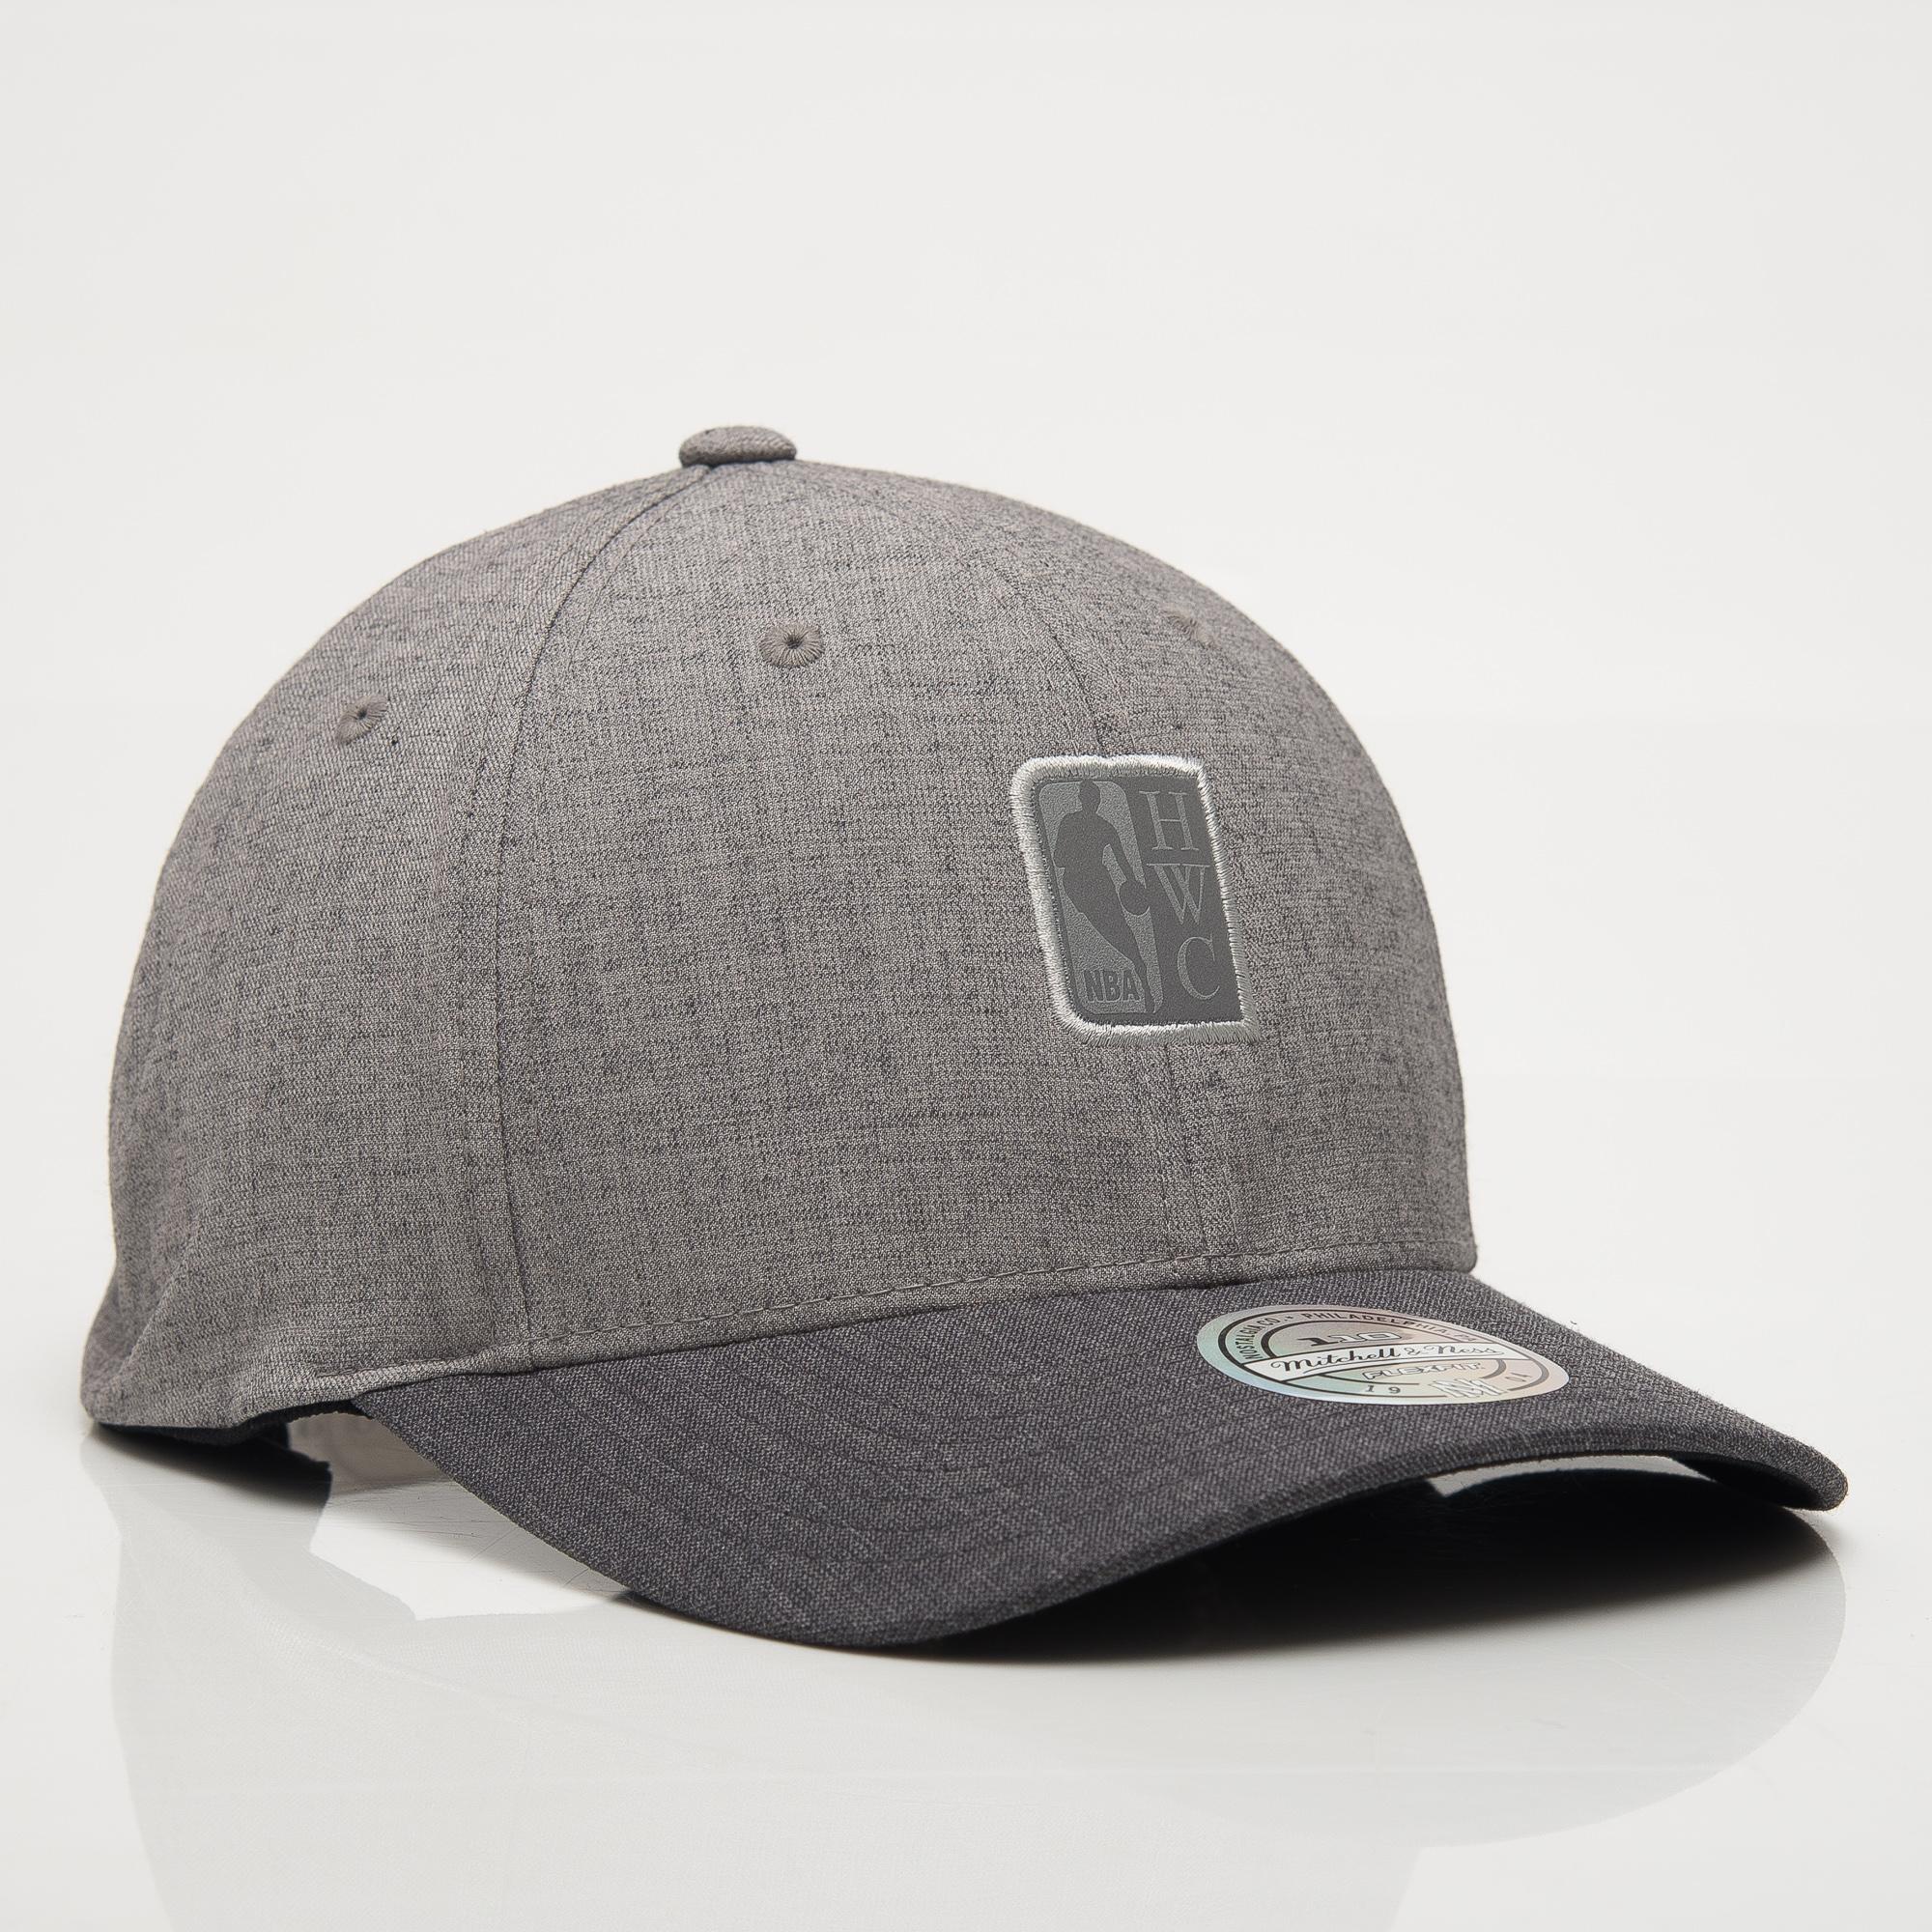 Mitchell   Ness HWC NBA Beam 110 Snapback Cap - NBA Shop Others NBA Clubs  Merchandise - Superfanas.lt 368295da0327